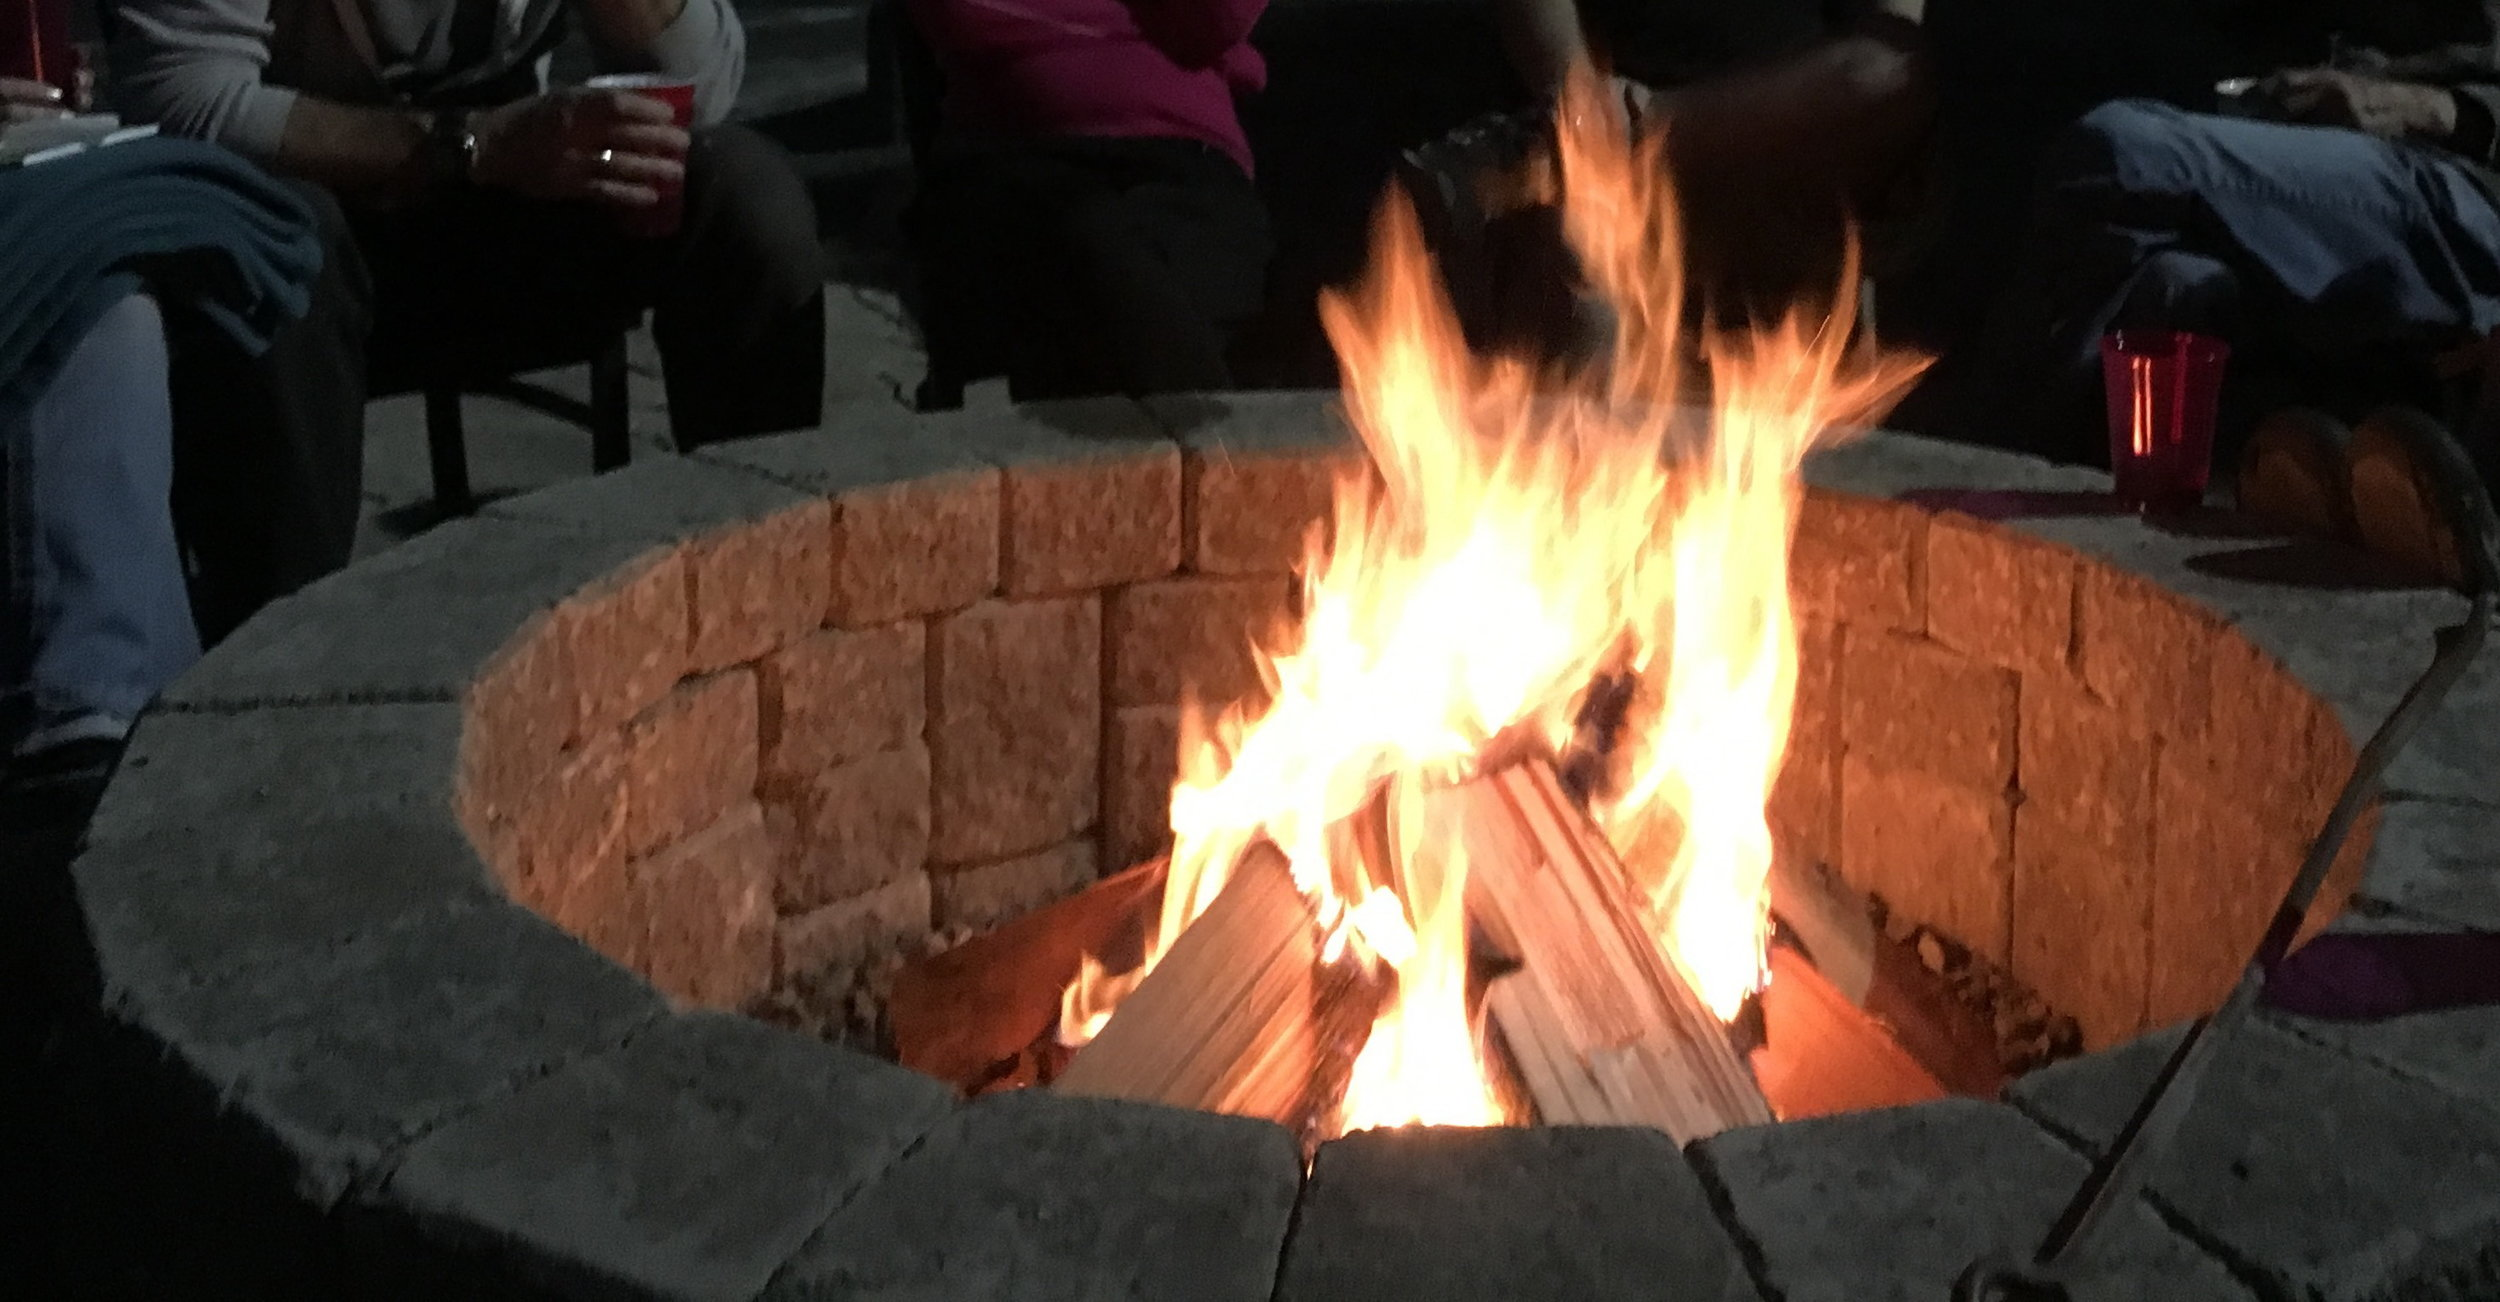 Fire Pit at night.JPG